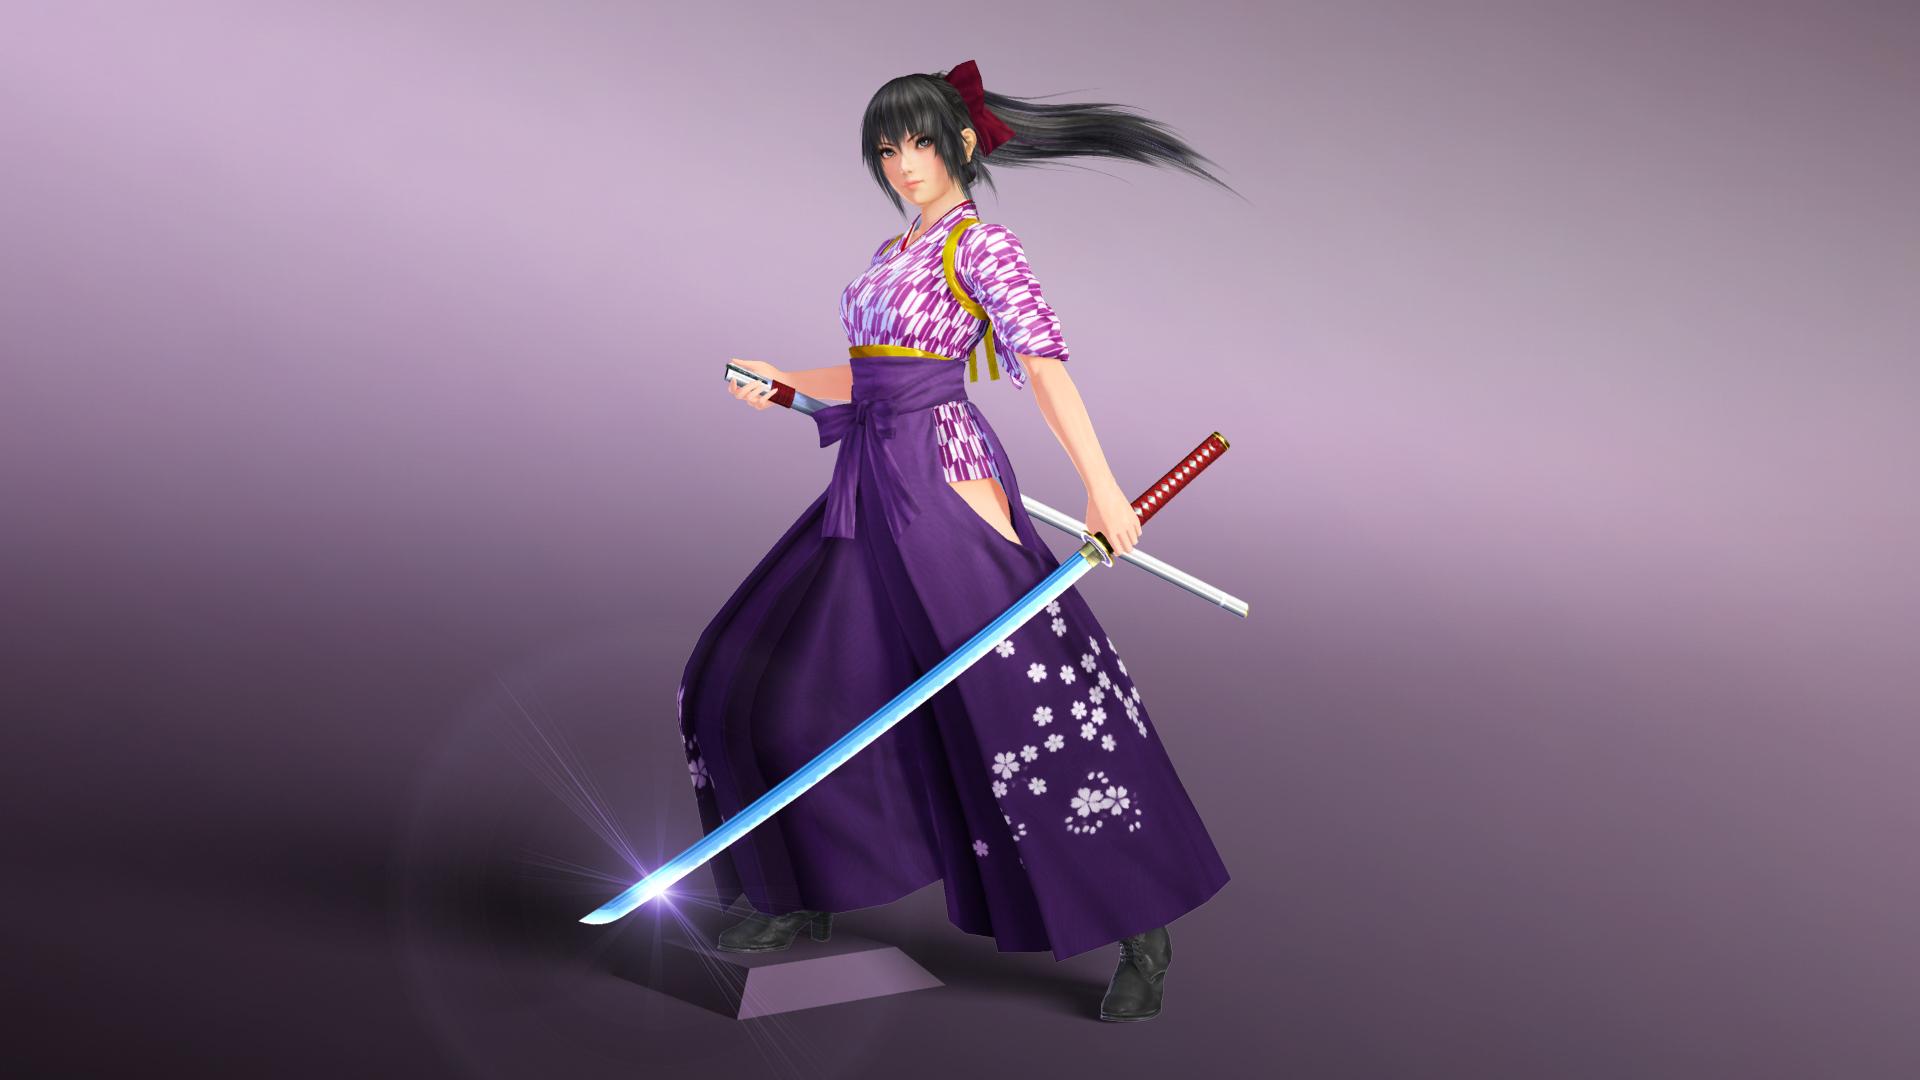 Mitsurugi Kamui Hikae - Brave Maiden | Steam Trading Cards ...